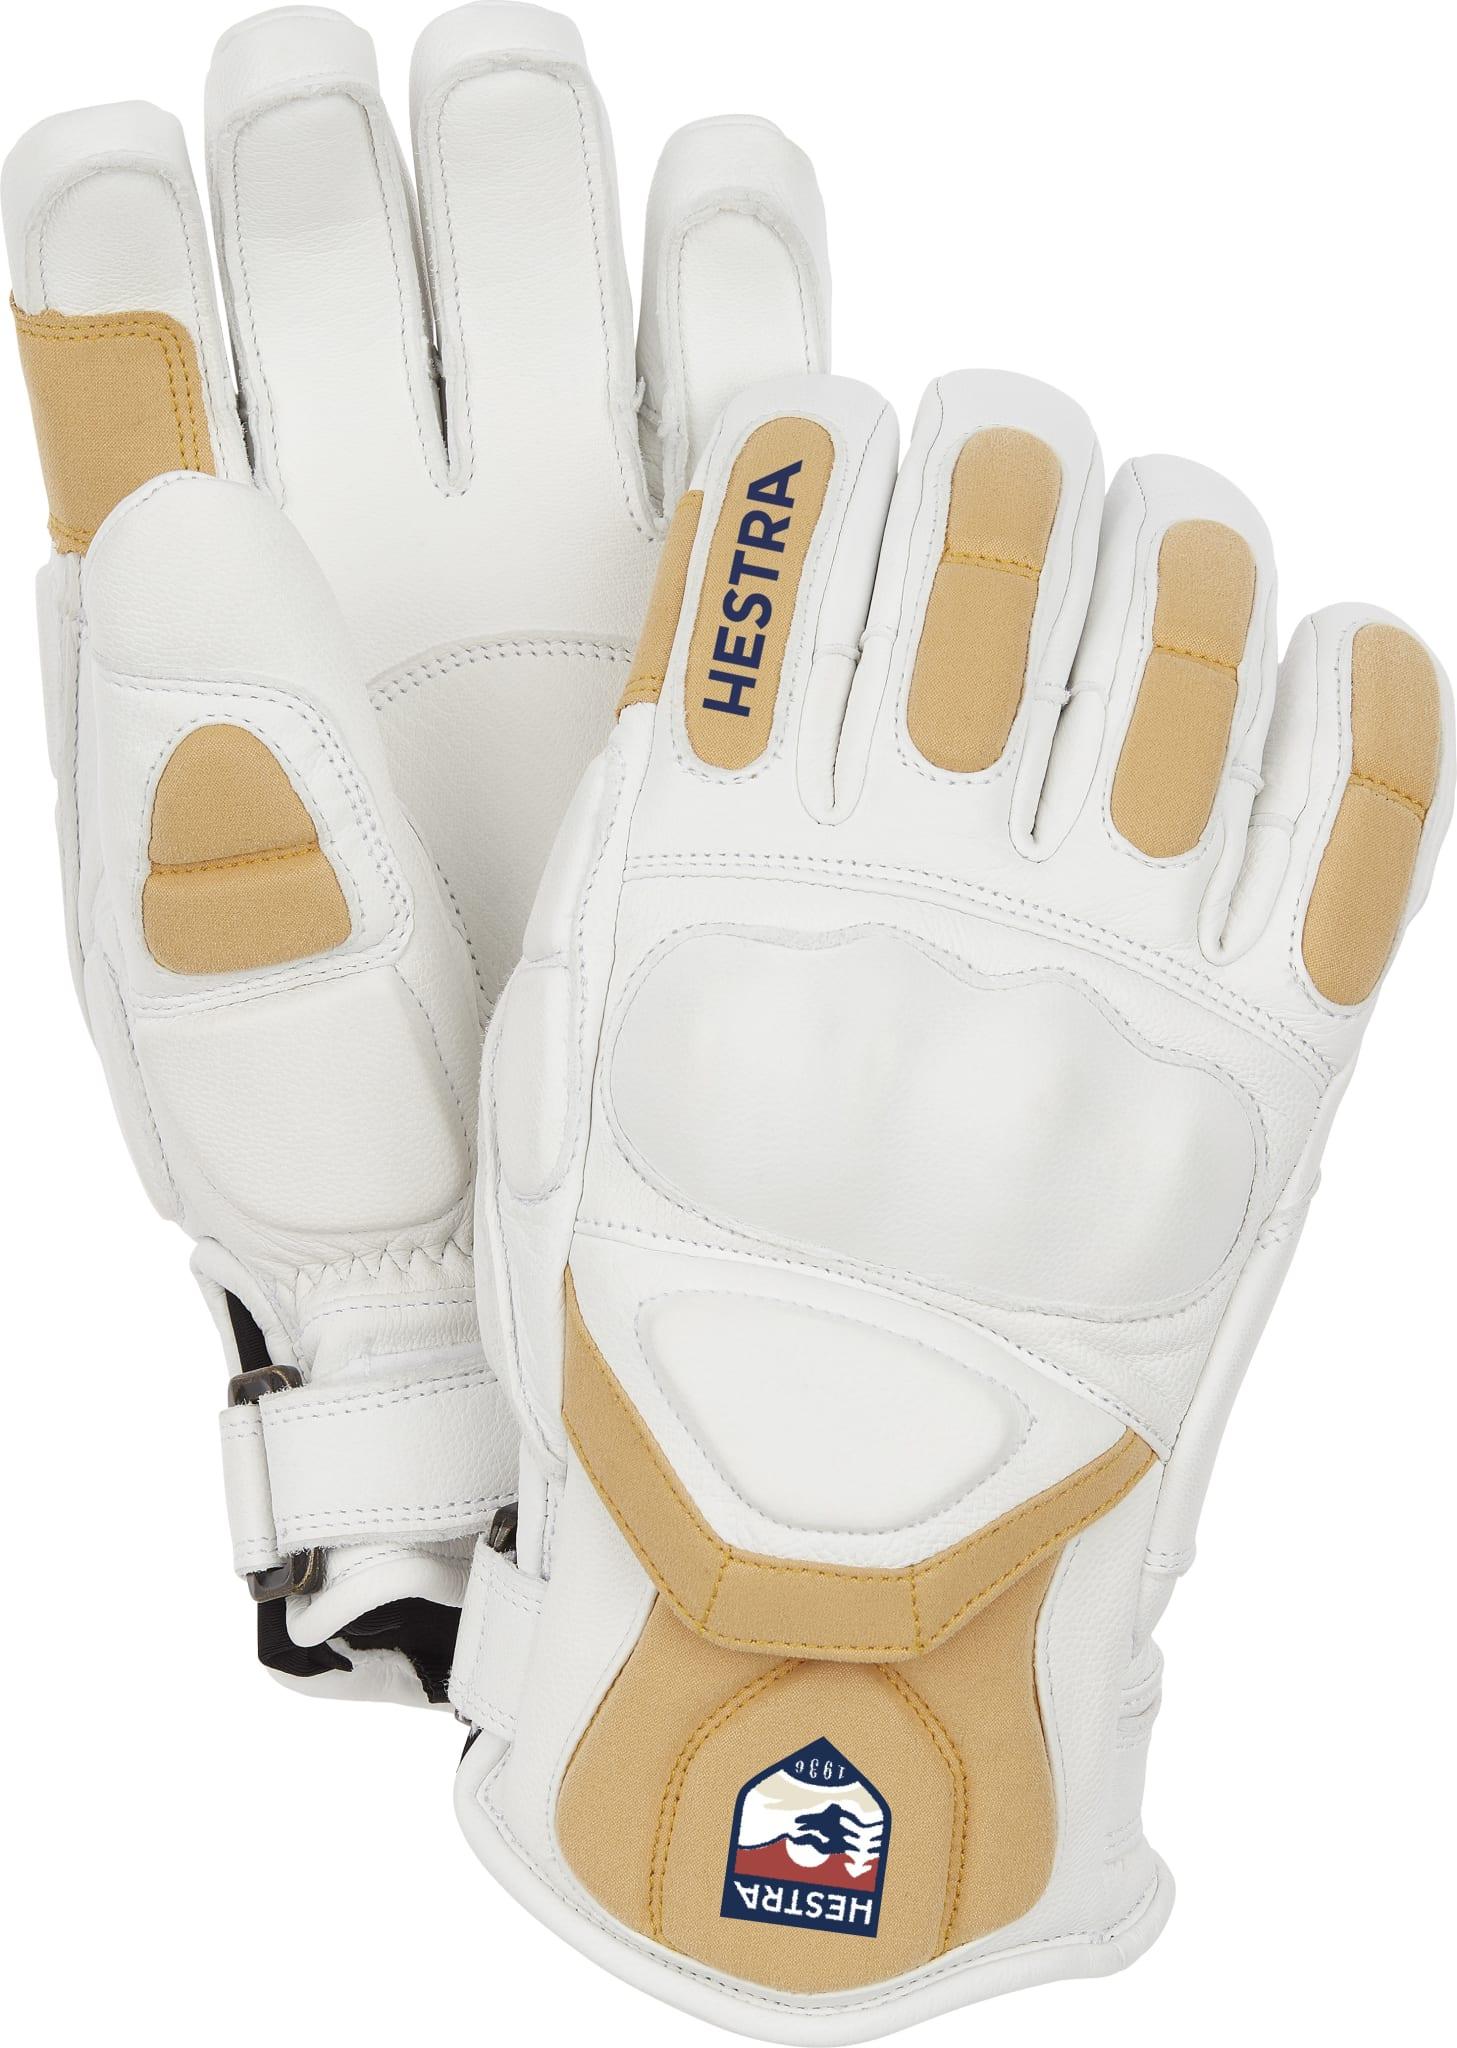 Impact Racing Gloves Sr